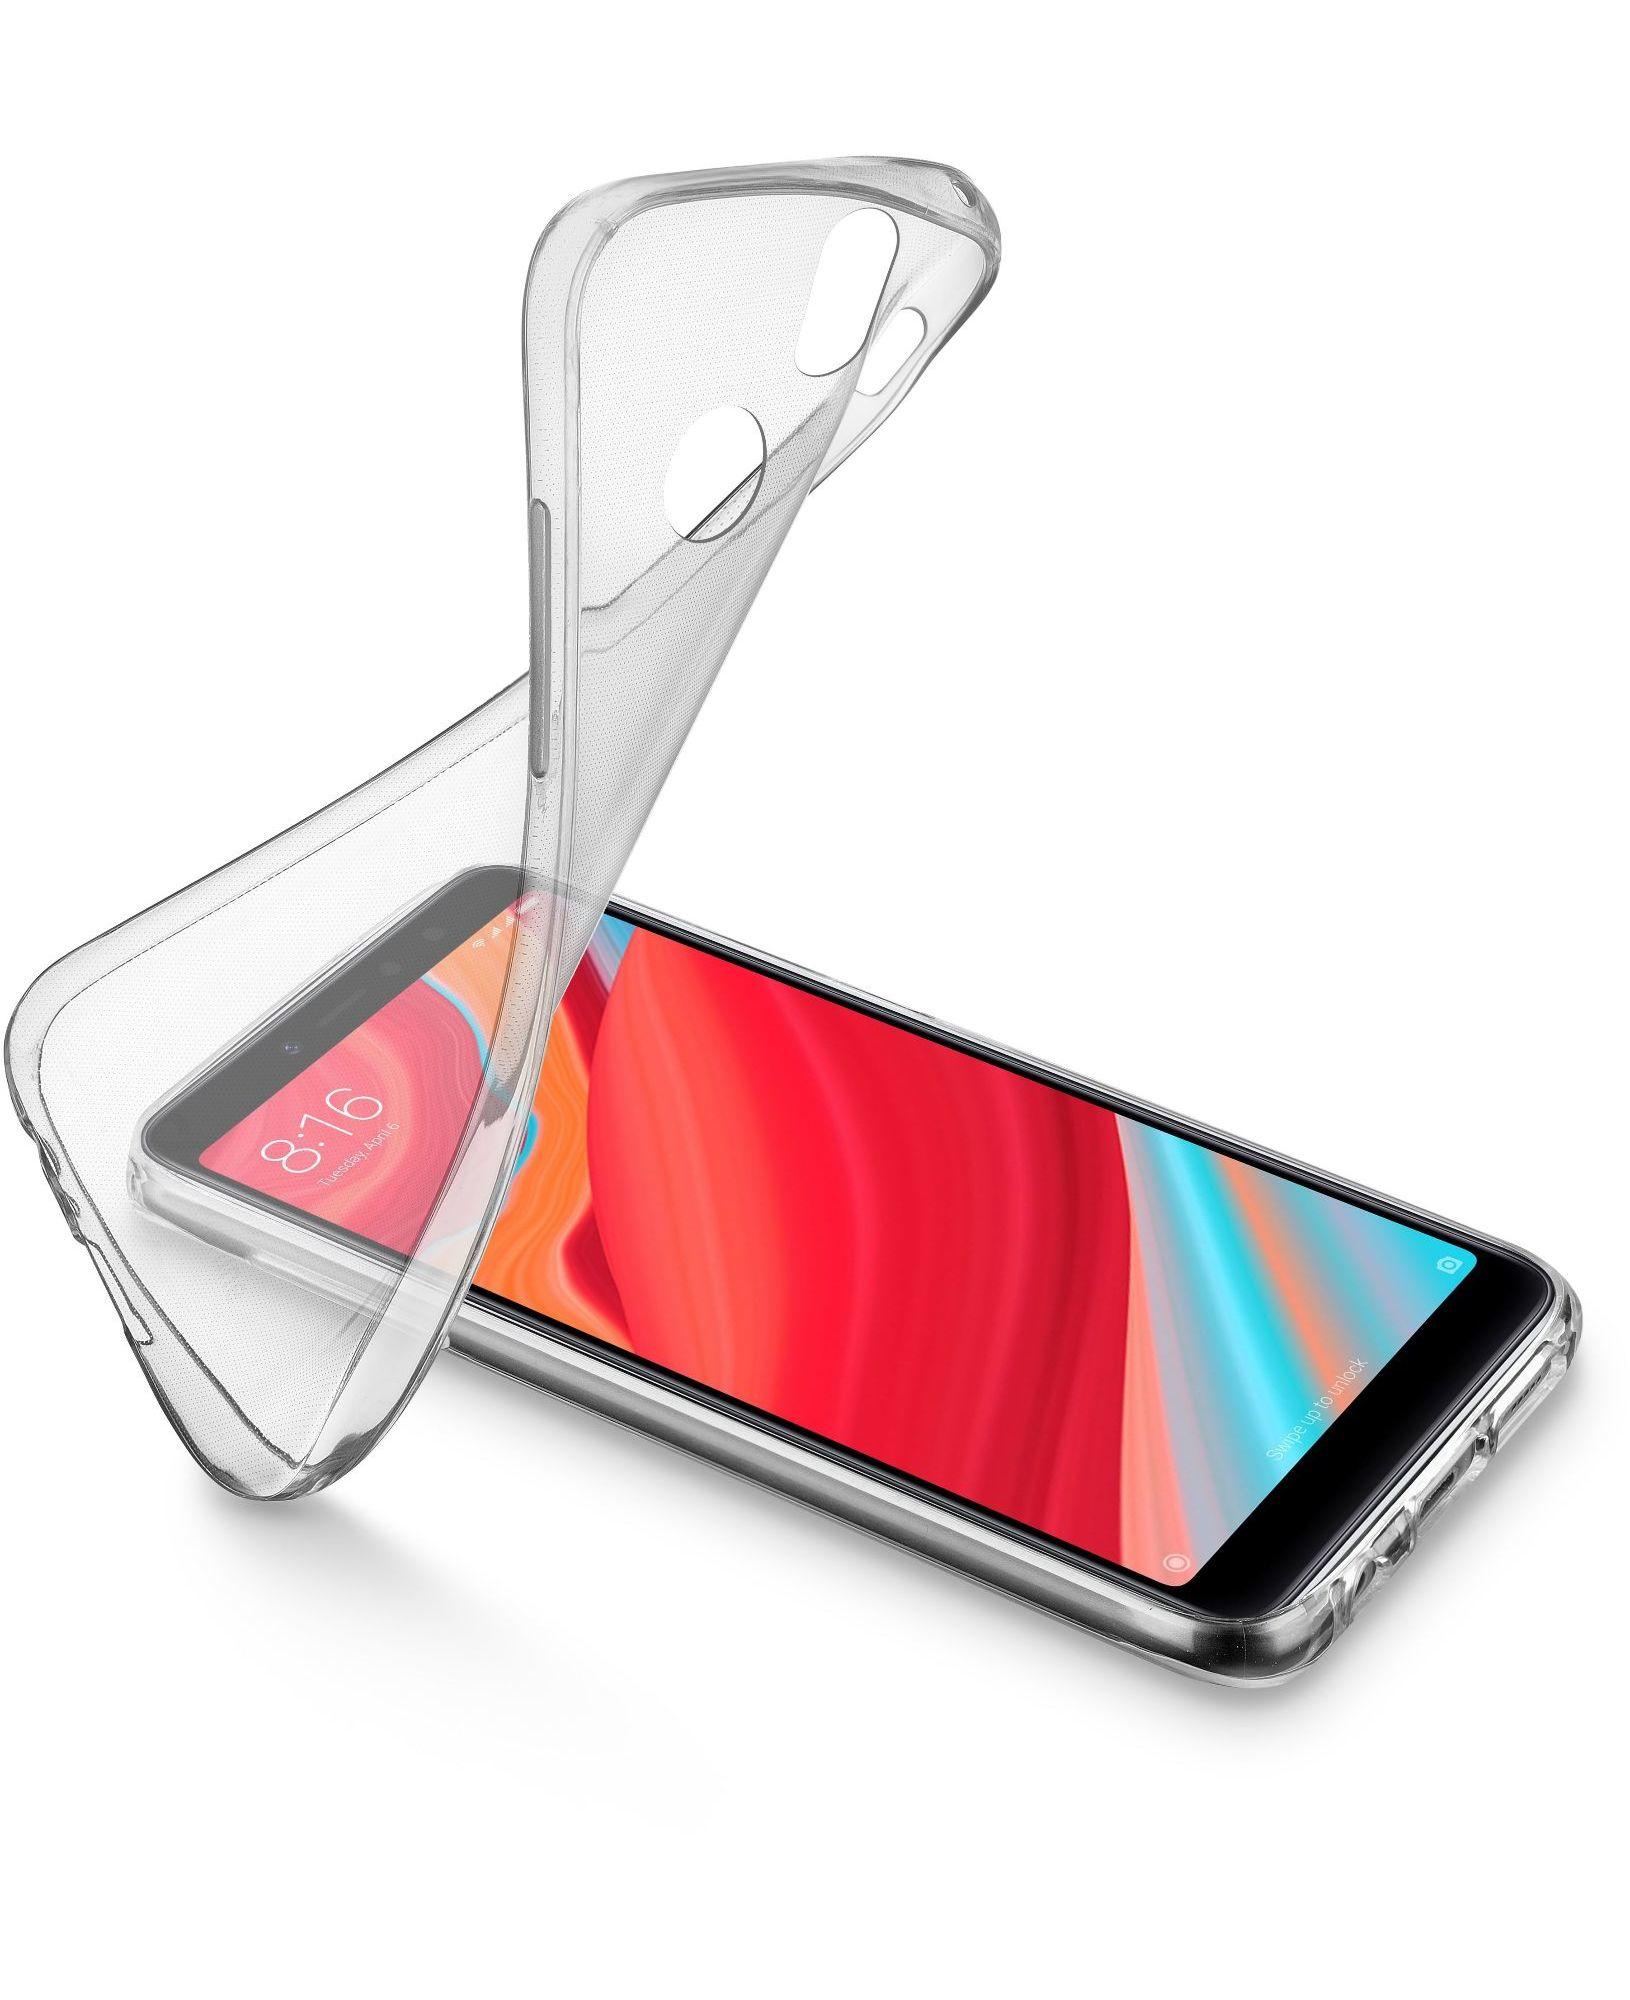 Cellular Line Custodia Xiaomi Redmi S2 - Softxiaores2t